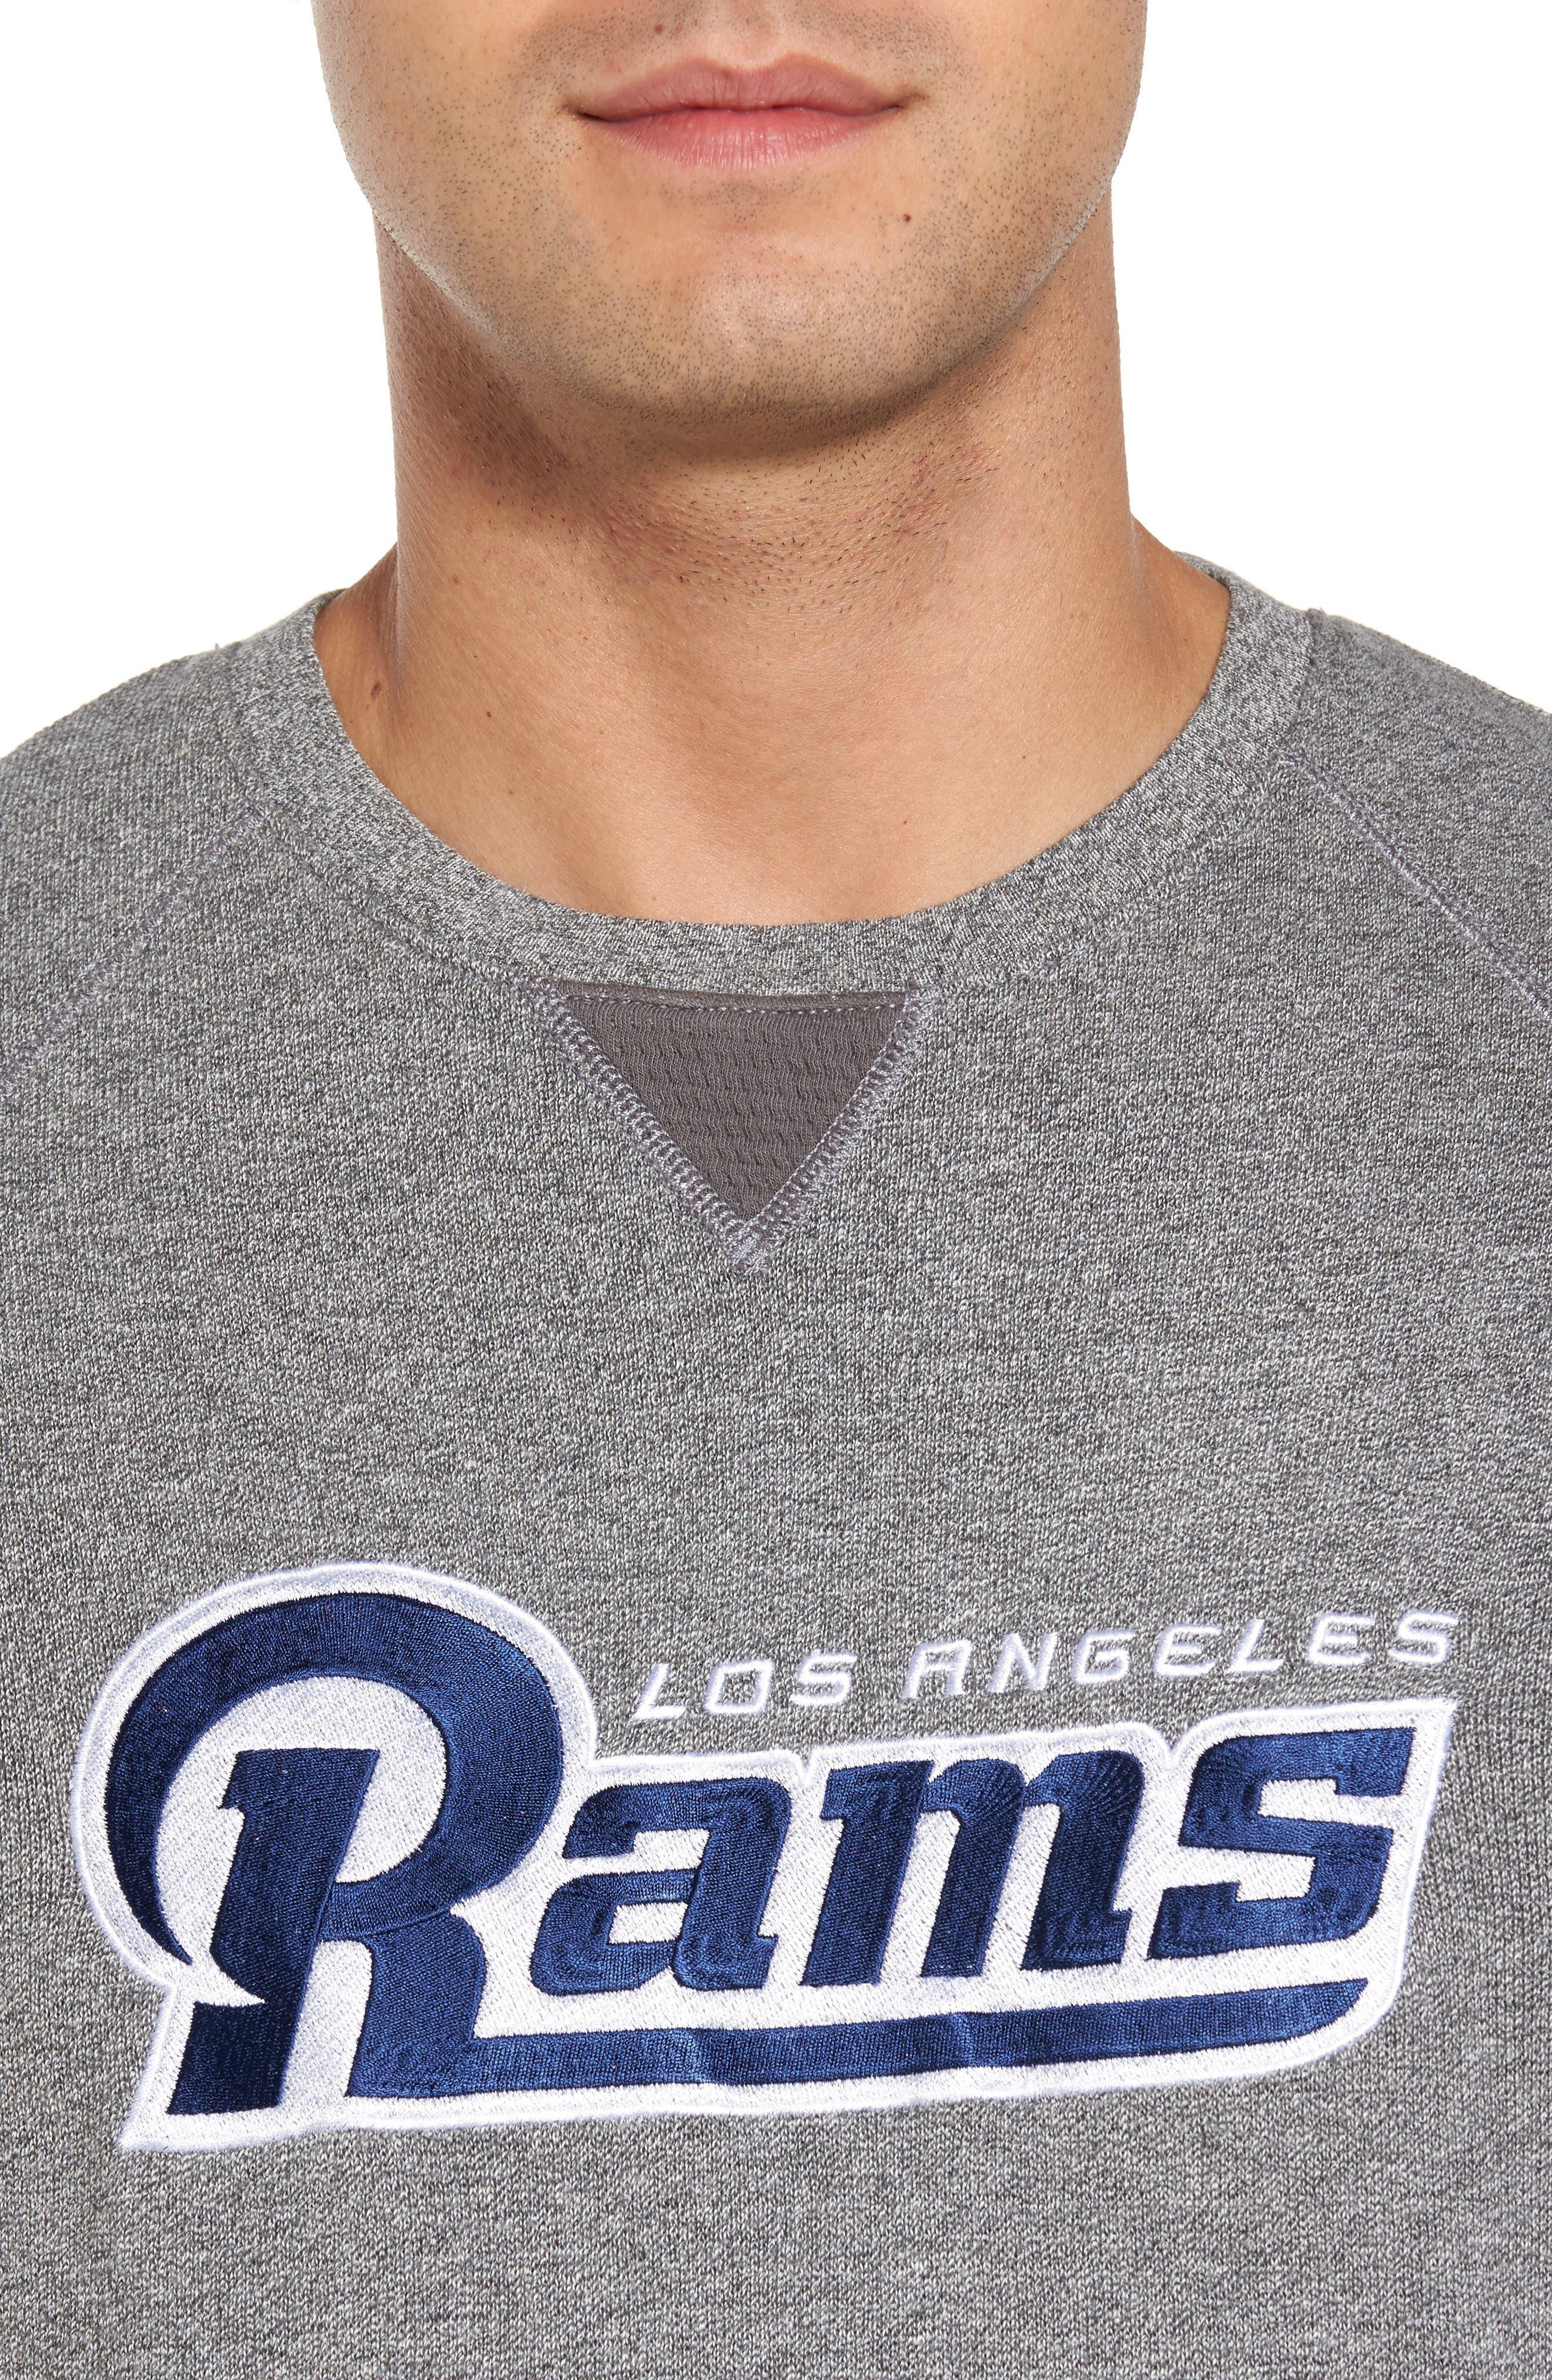 NFL Stitch of Liberty Embroidered Crewneck Sweatshirt,                             Alternate thumbnail 116, color,